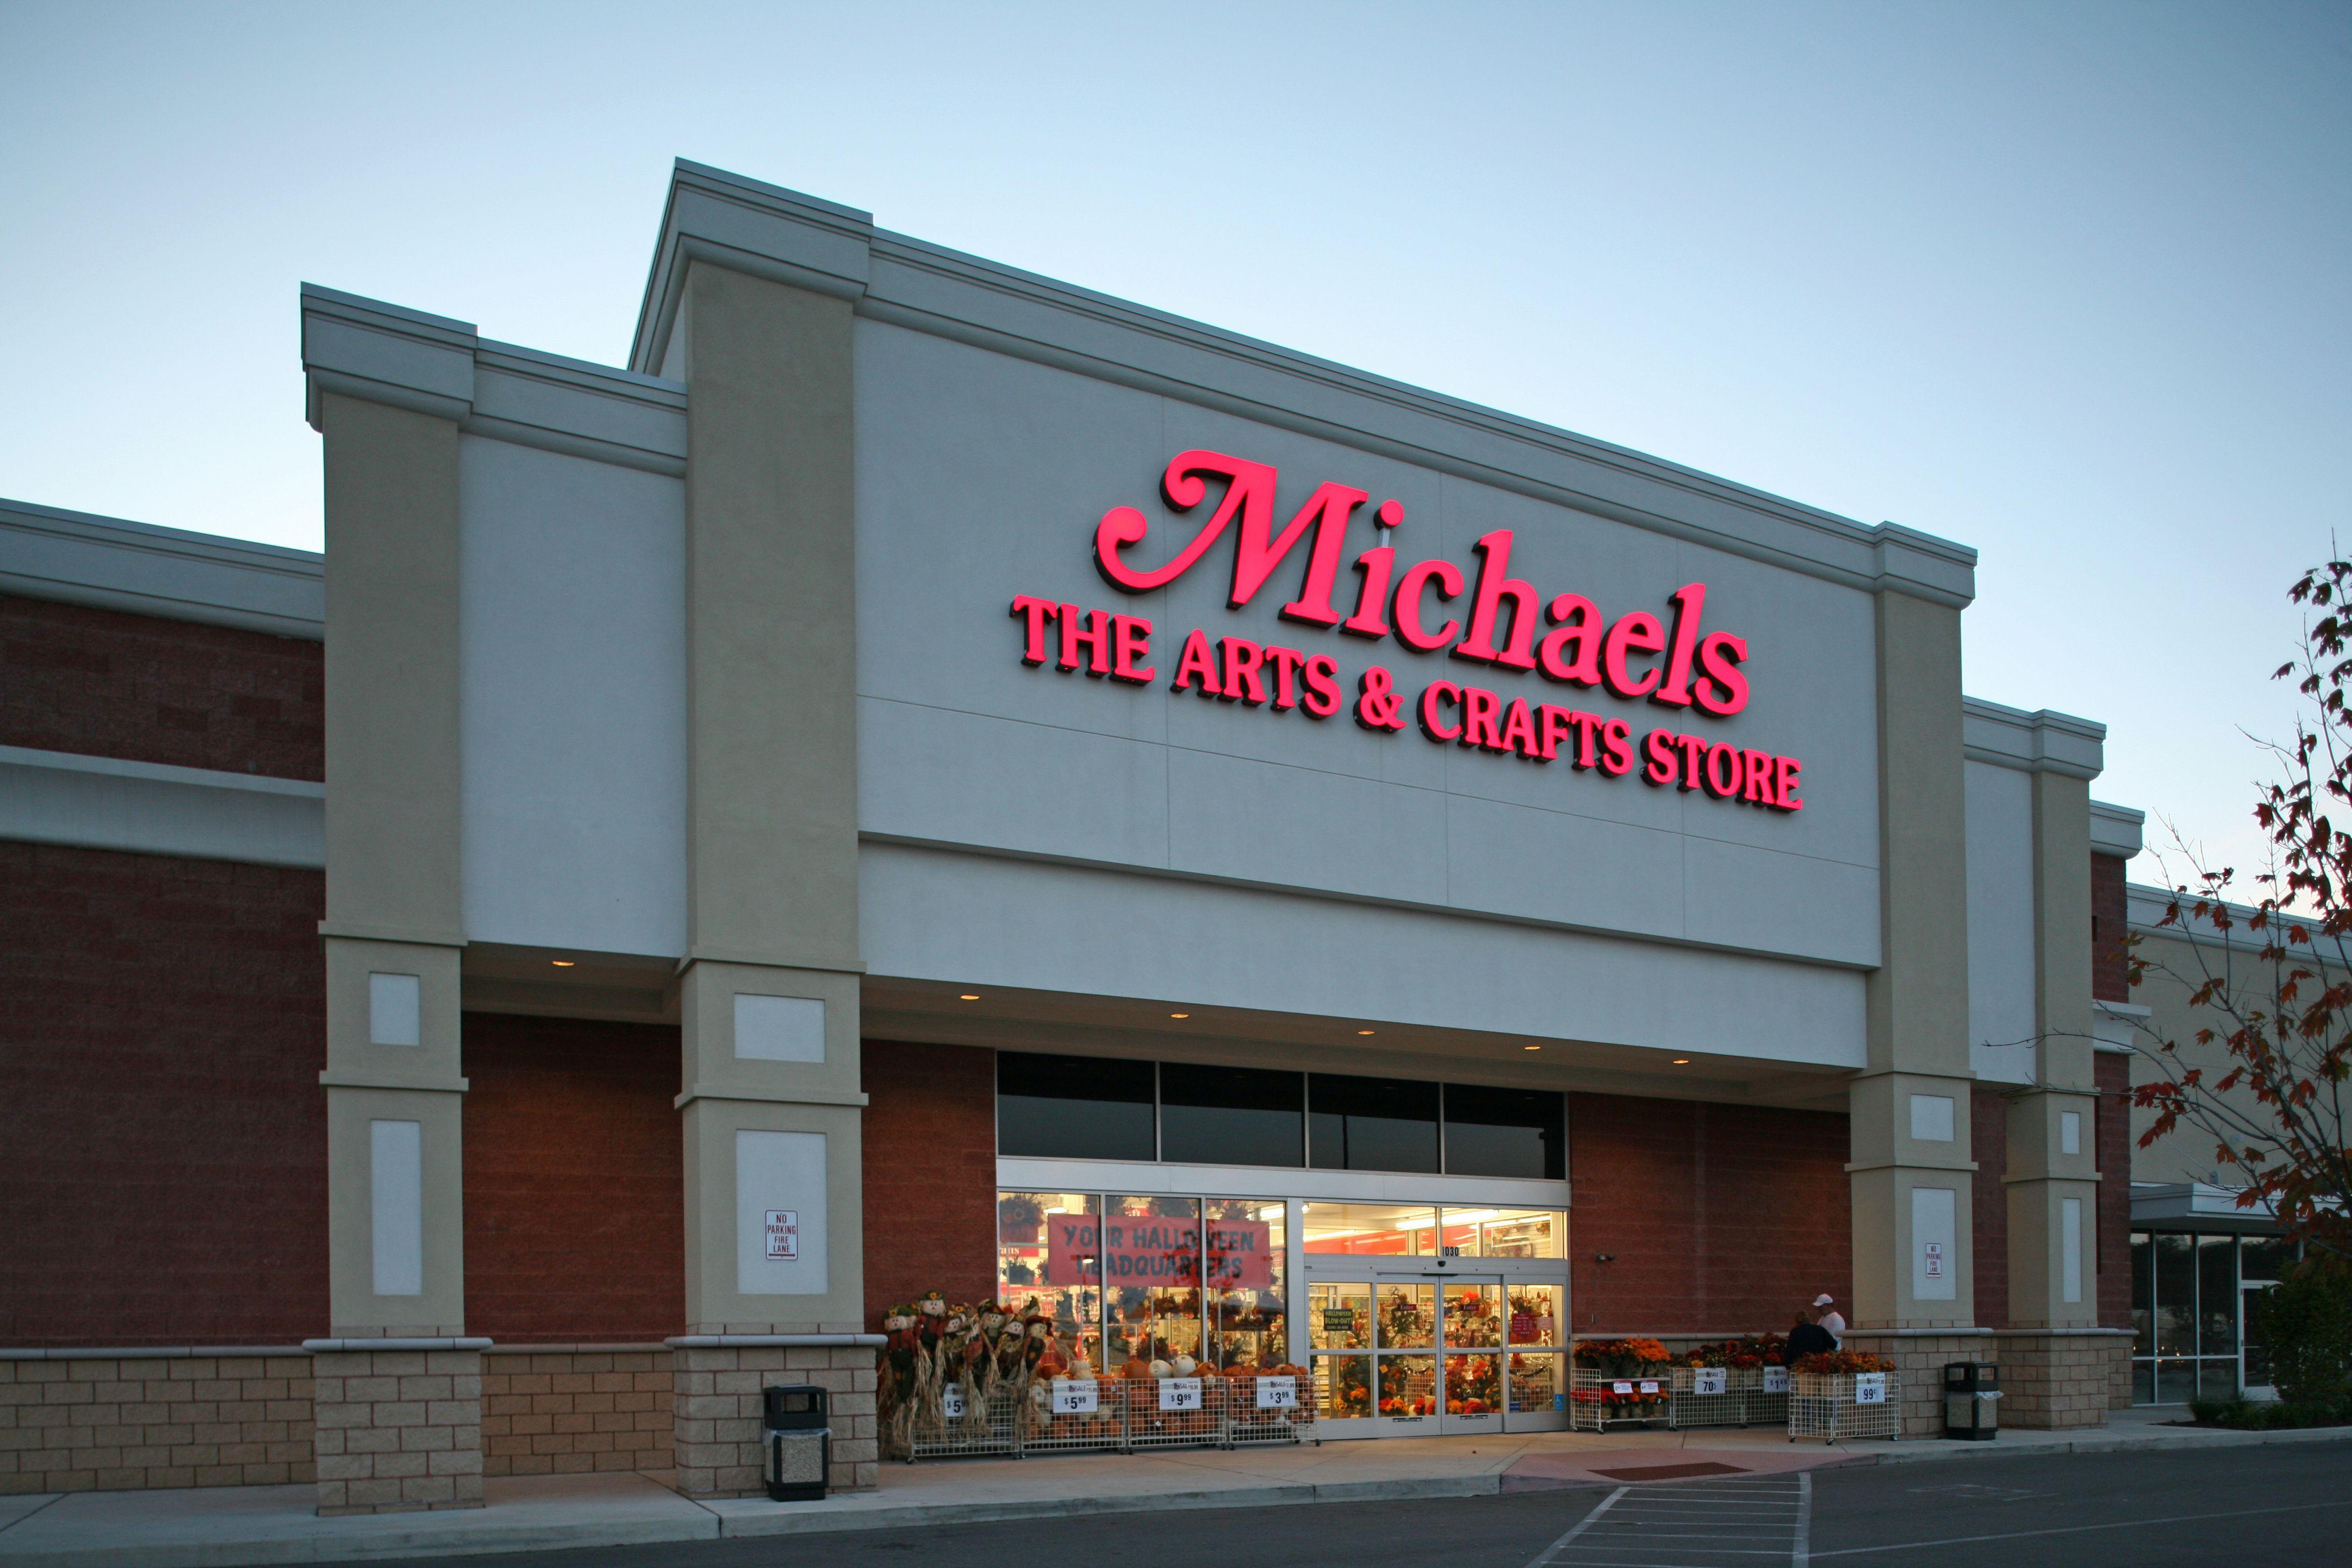 michaels craft store exterior shot